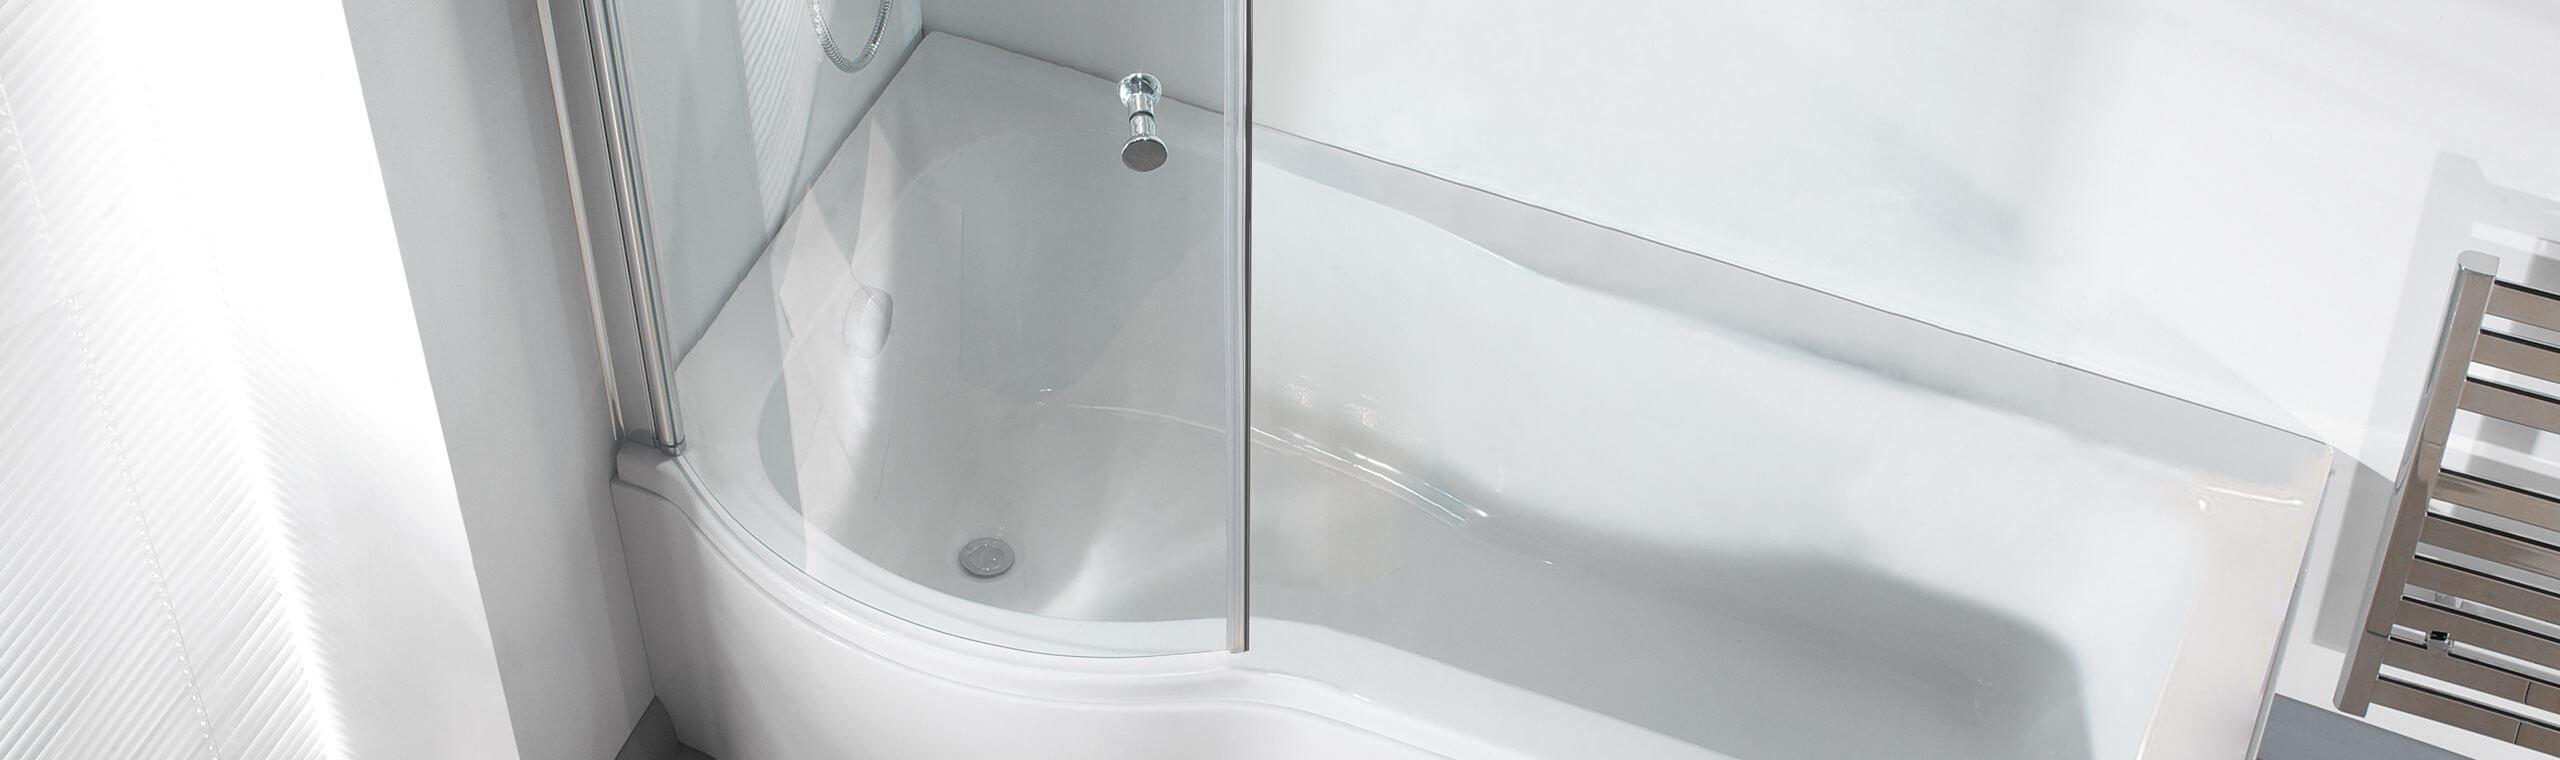 P Shaped Shower Baths